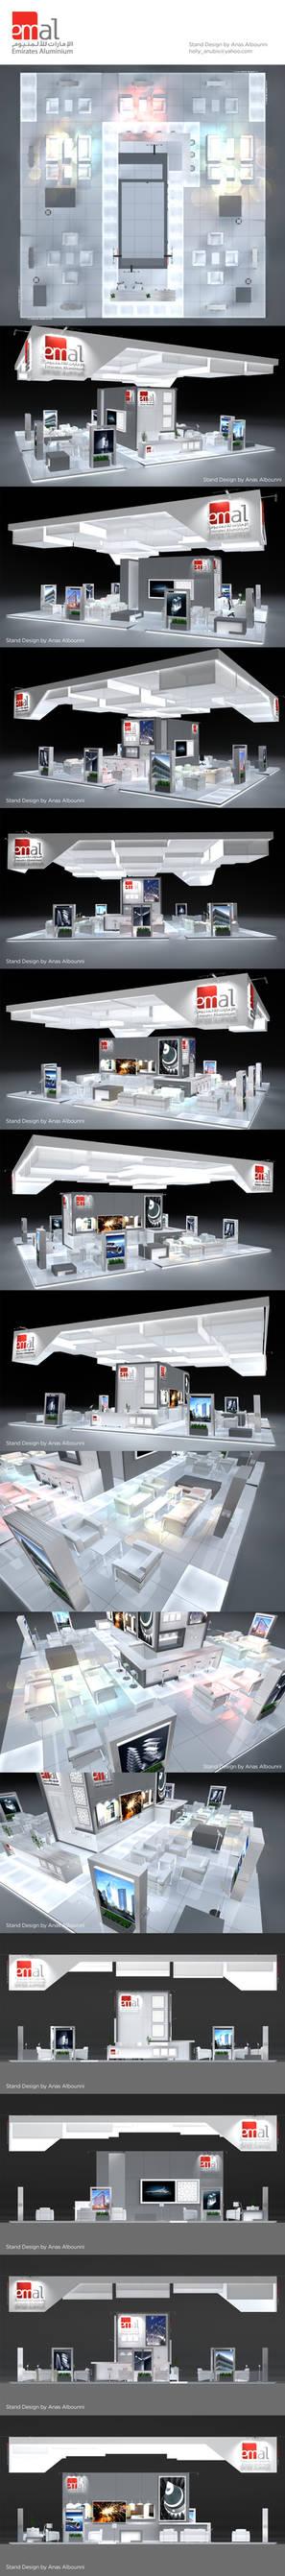 Emal Stand Design